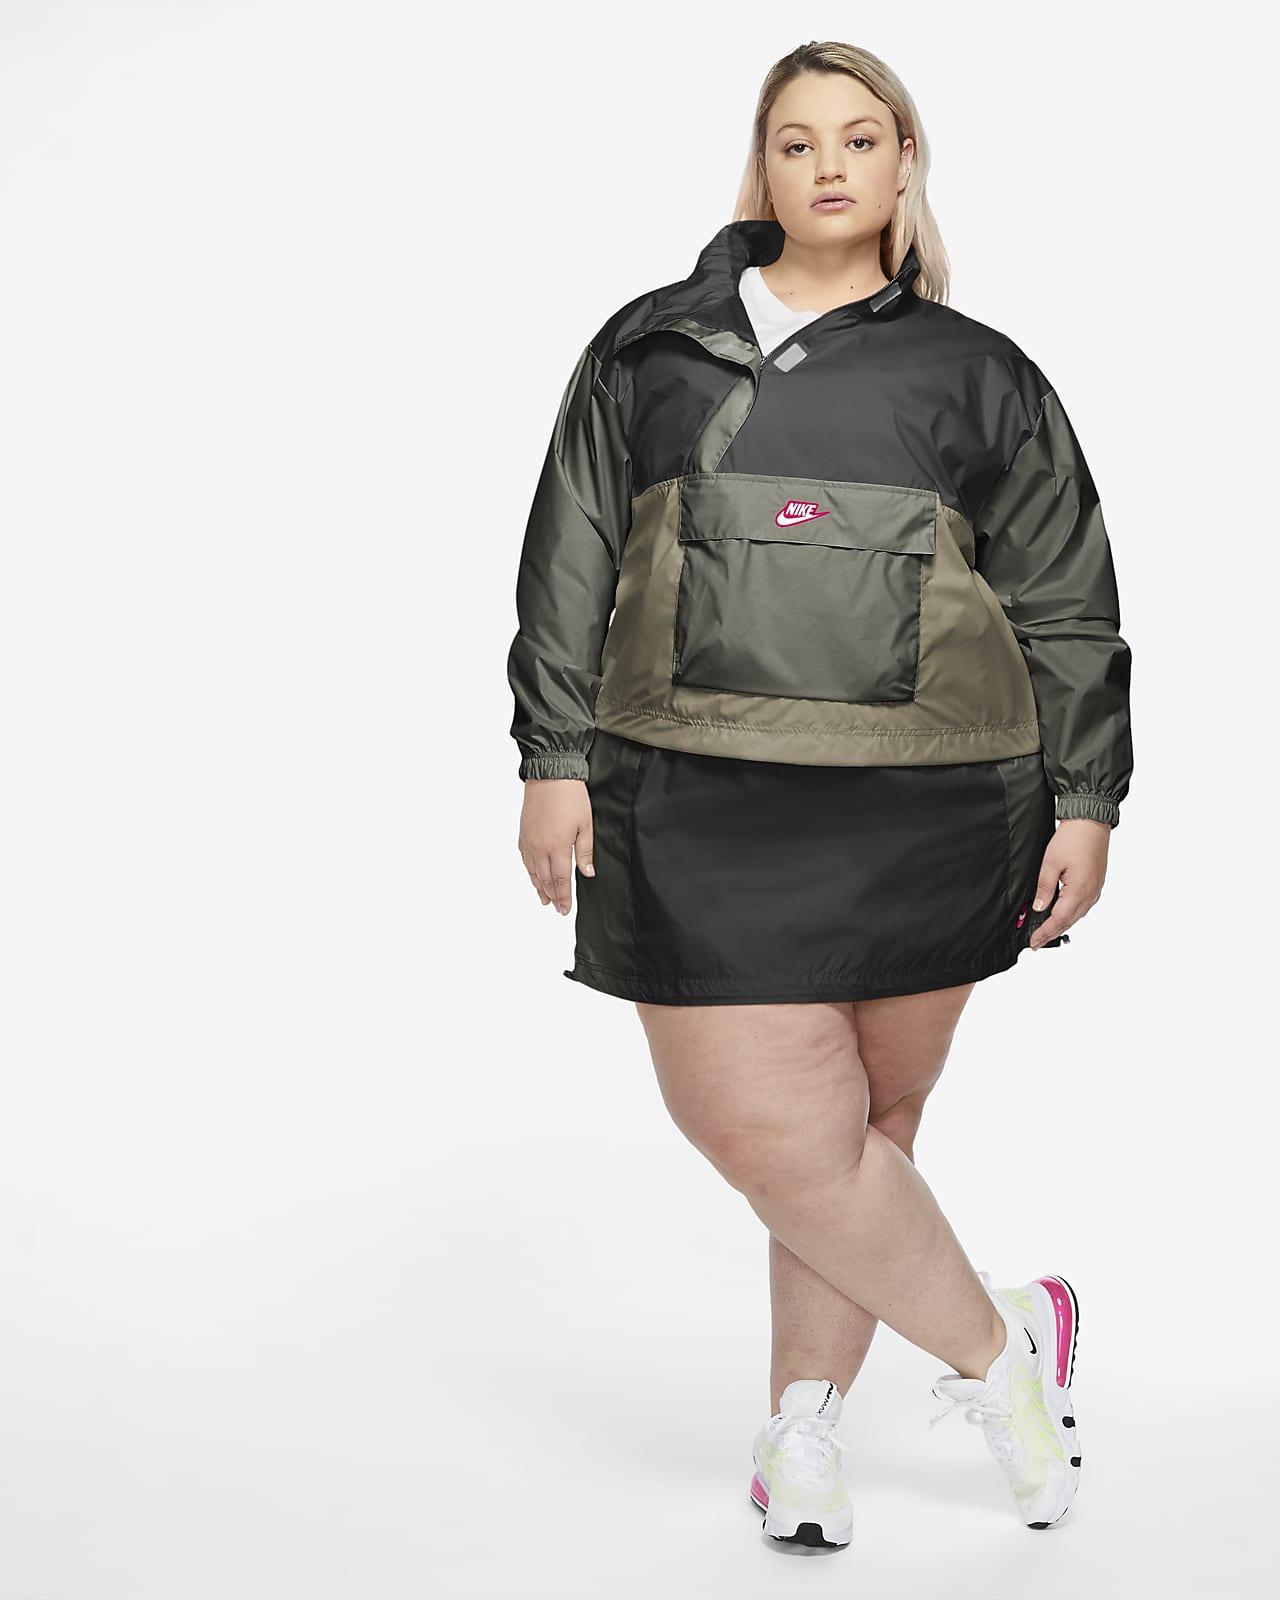 Anorak tissé Nike Sportswear Icon Clash pour Femme (grande taille) mannequin grande taille Nike